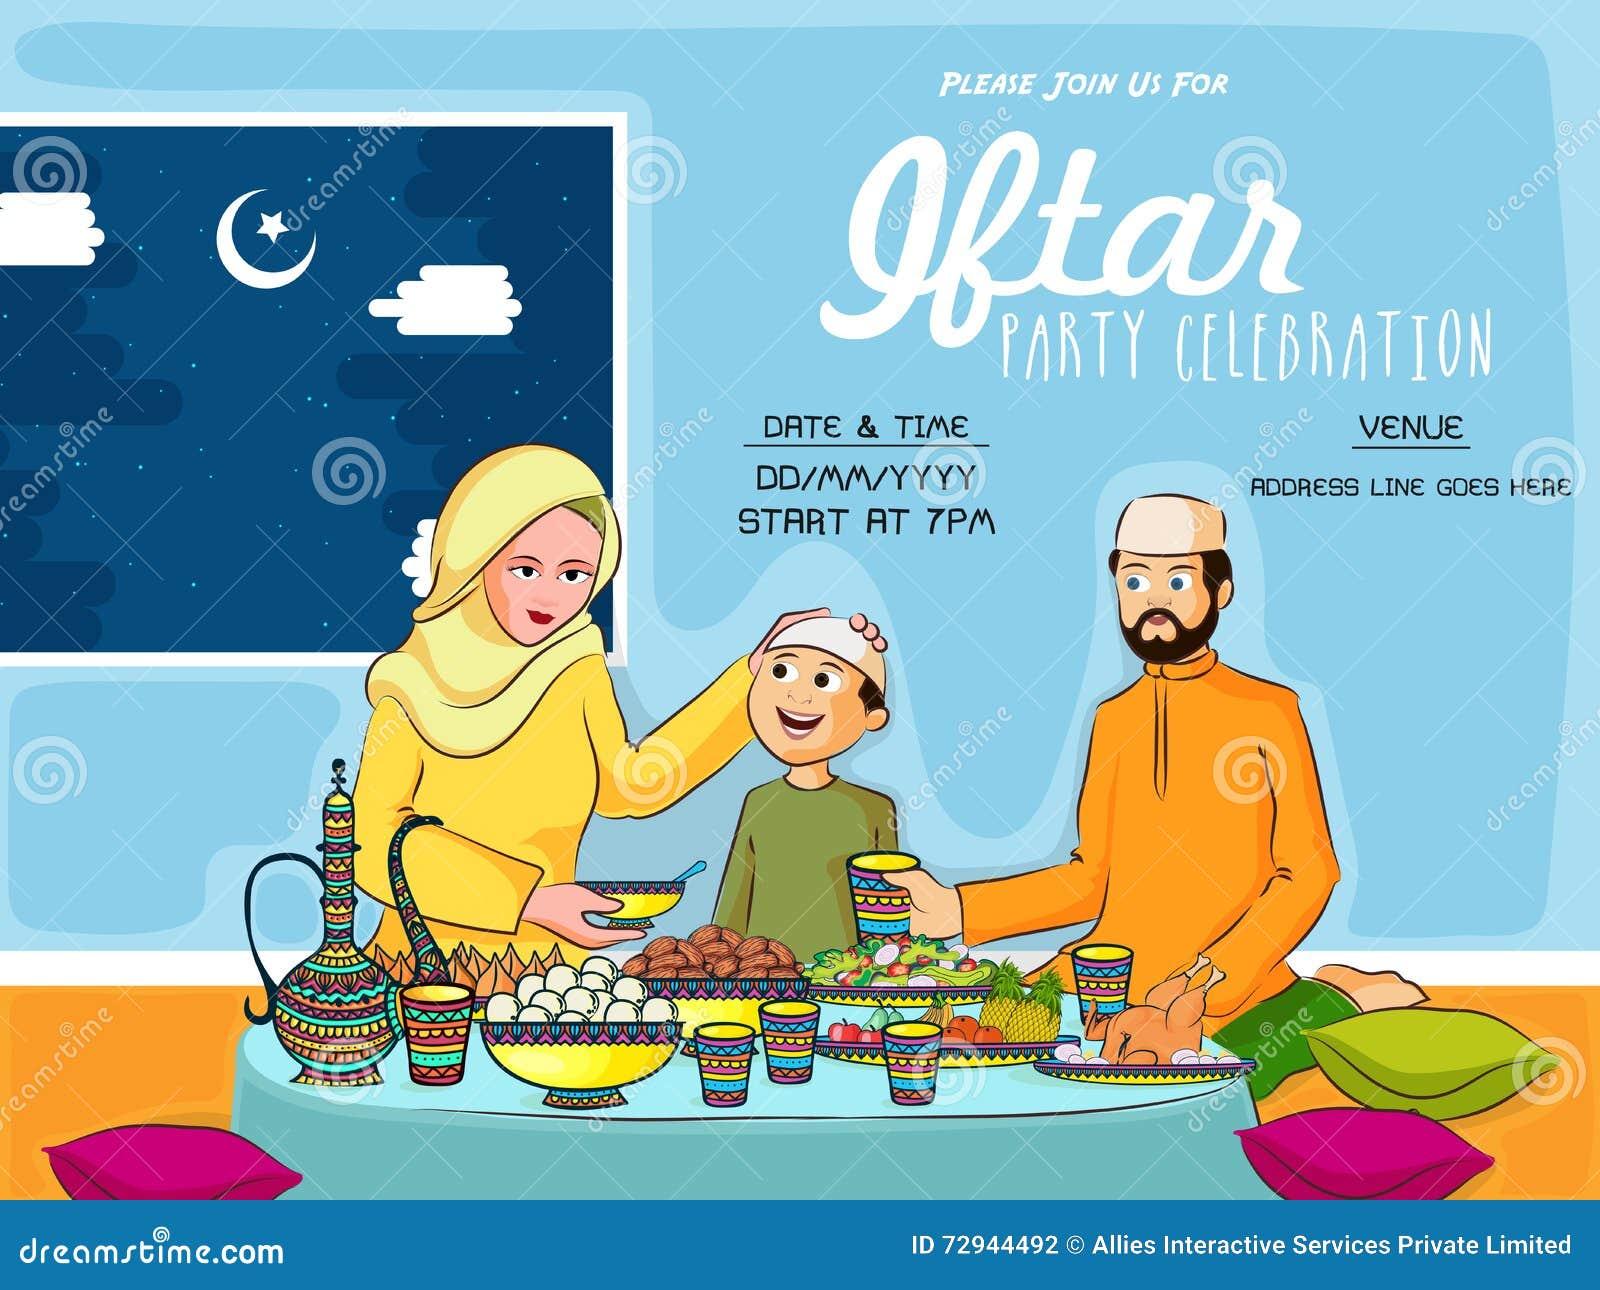 Ramadan Kareem Iftar Party Invitation Card Stock Illustrations – 320 ... for Ramadan Iftar Clipart  174mzq